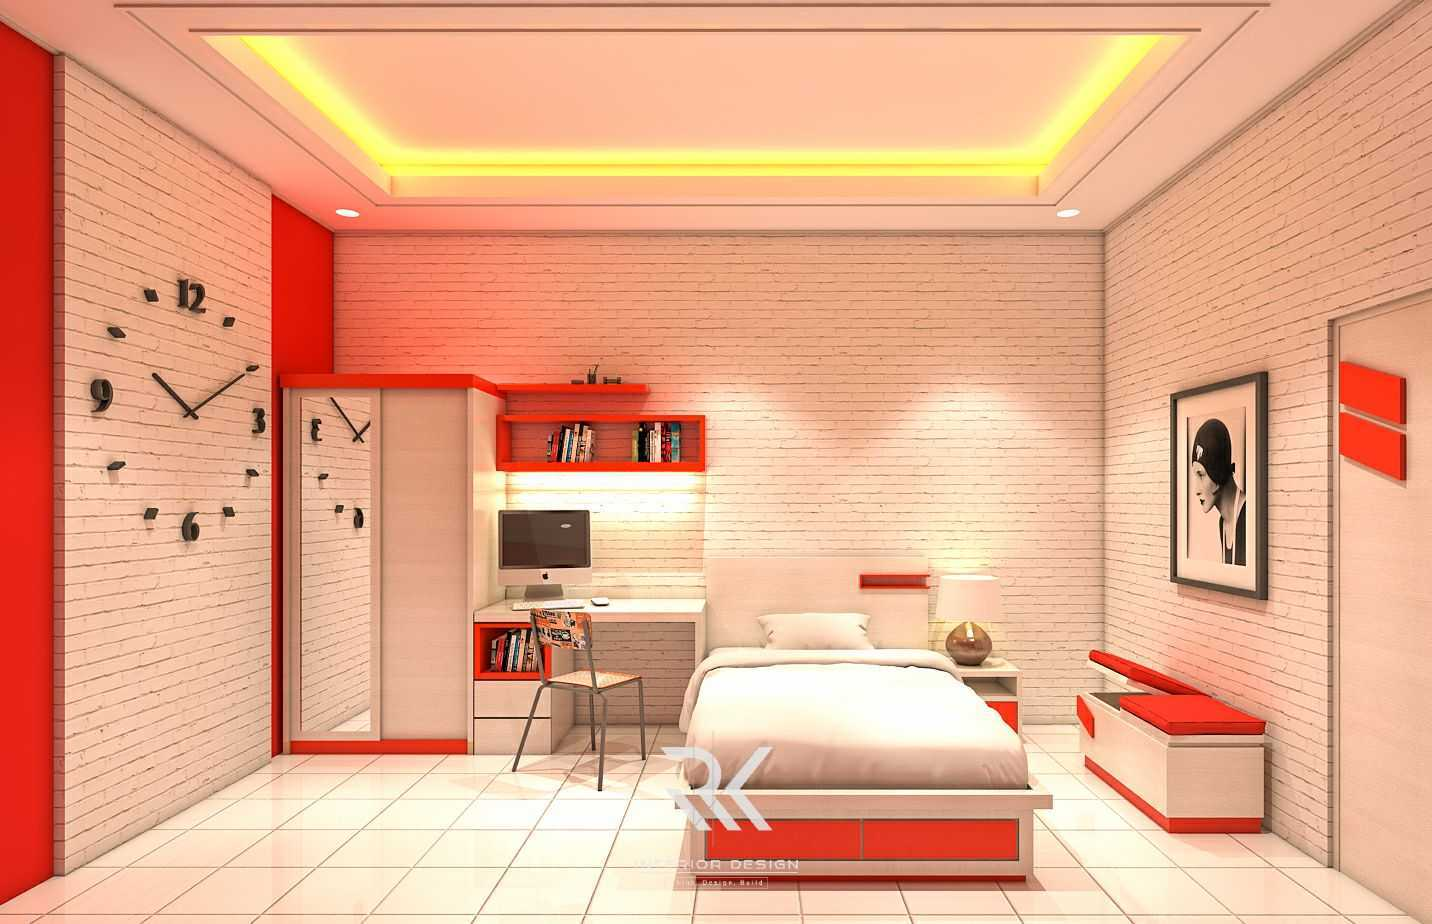 Rk Interior Bedroom Anak Kabupaten Purworejo, Jawa Tengah, Indonesia Kabupaten Purworejo, Jawa Tengah, Indonesia Rk-Interior-Bedroom-Anak  69534